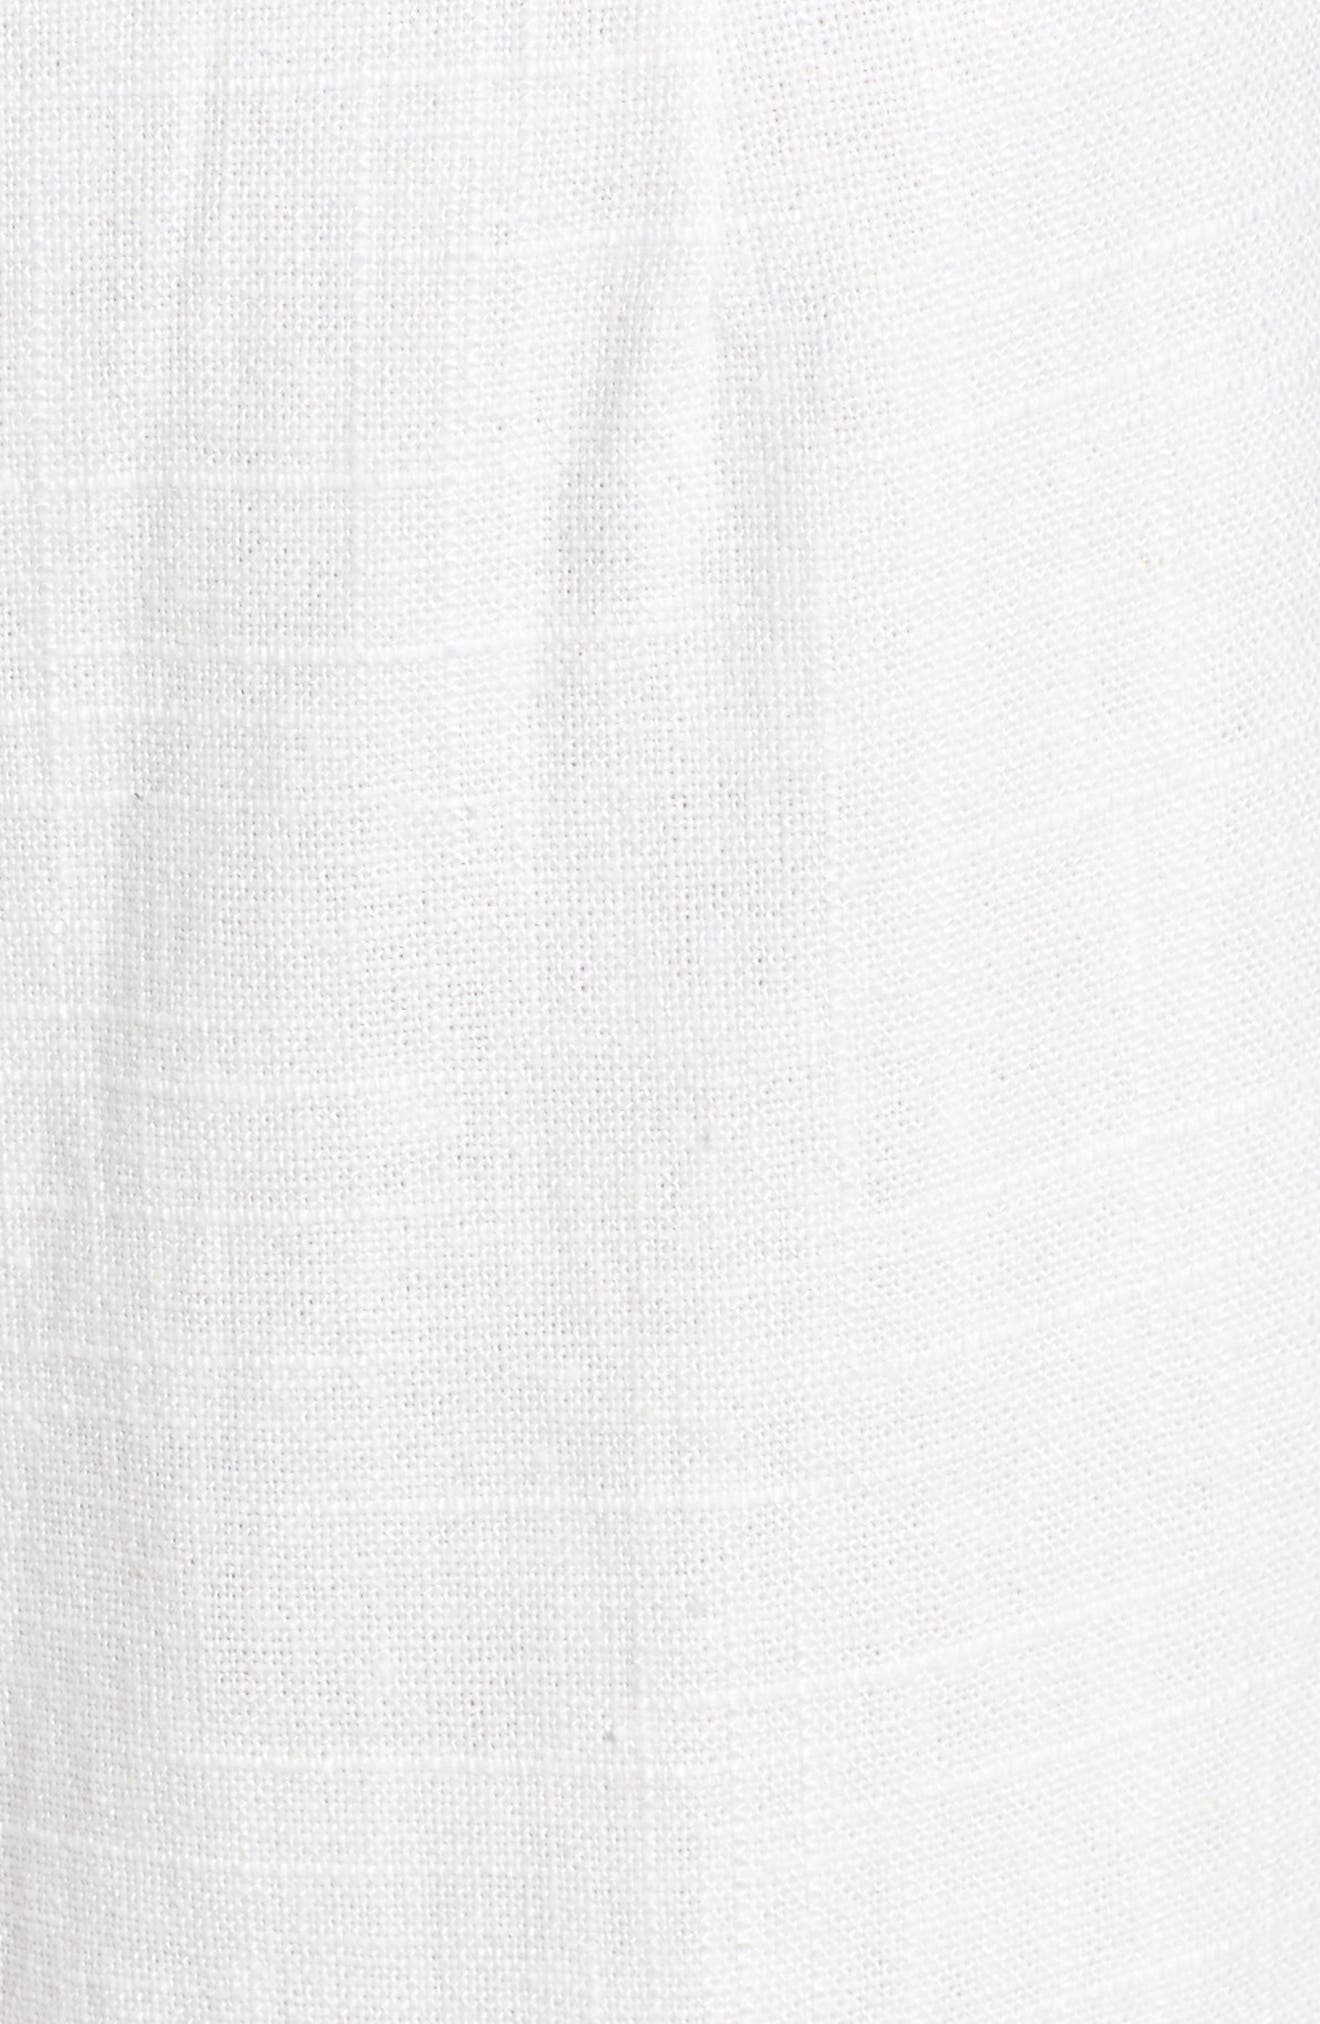 Linen High Waist Crop Pants,                             Alternate thumbnail 7, color,                             White